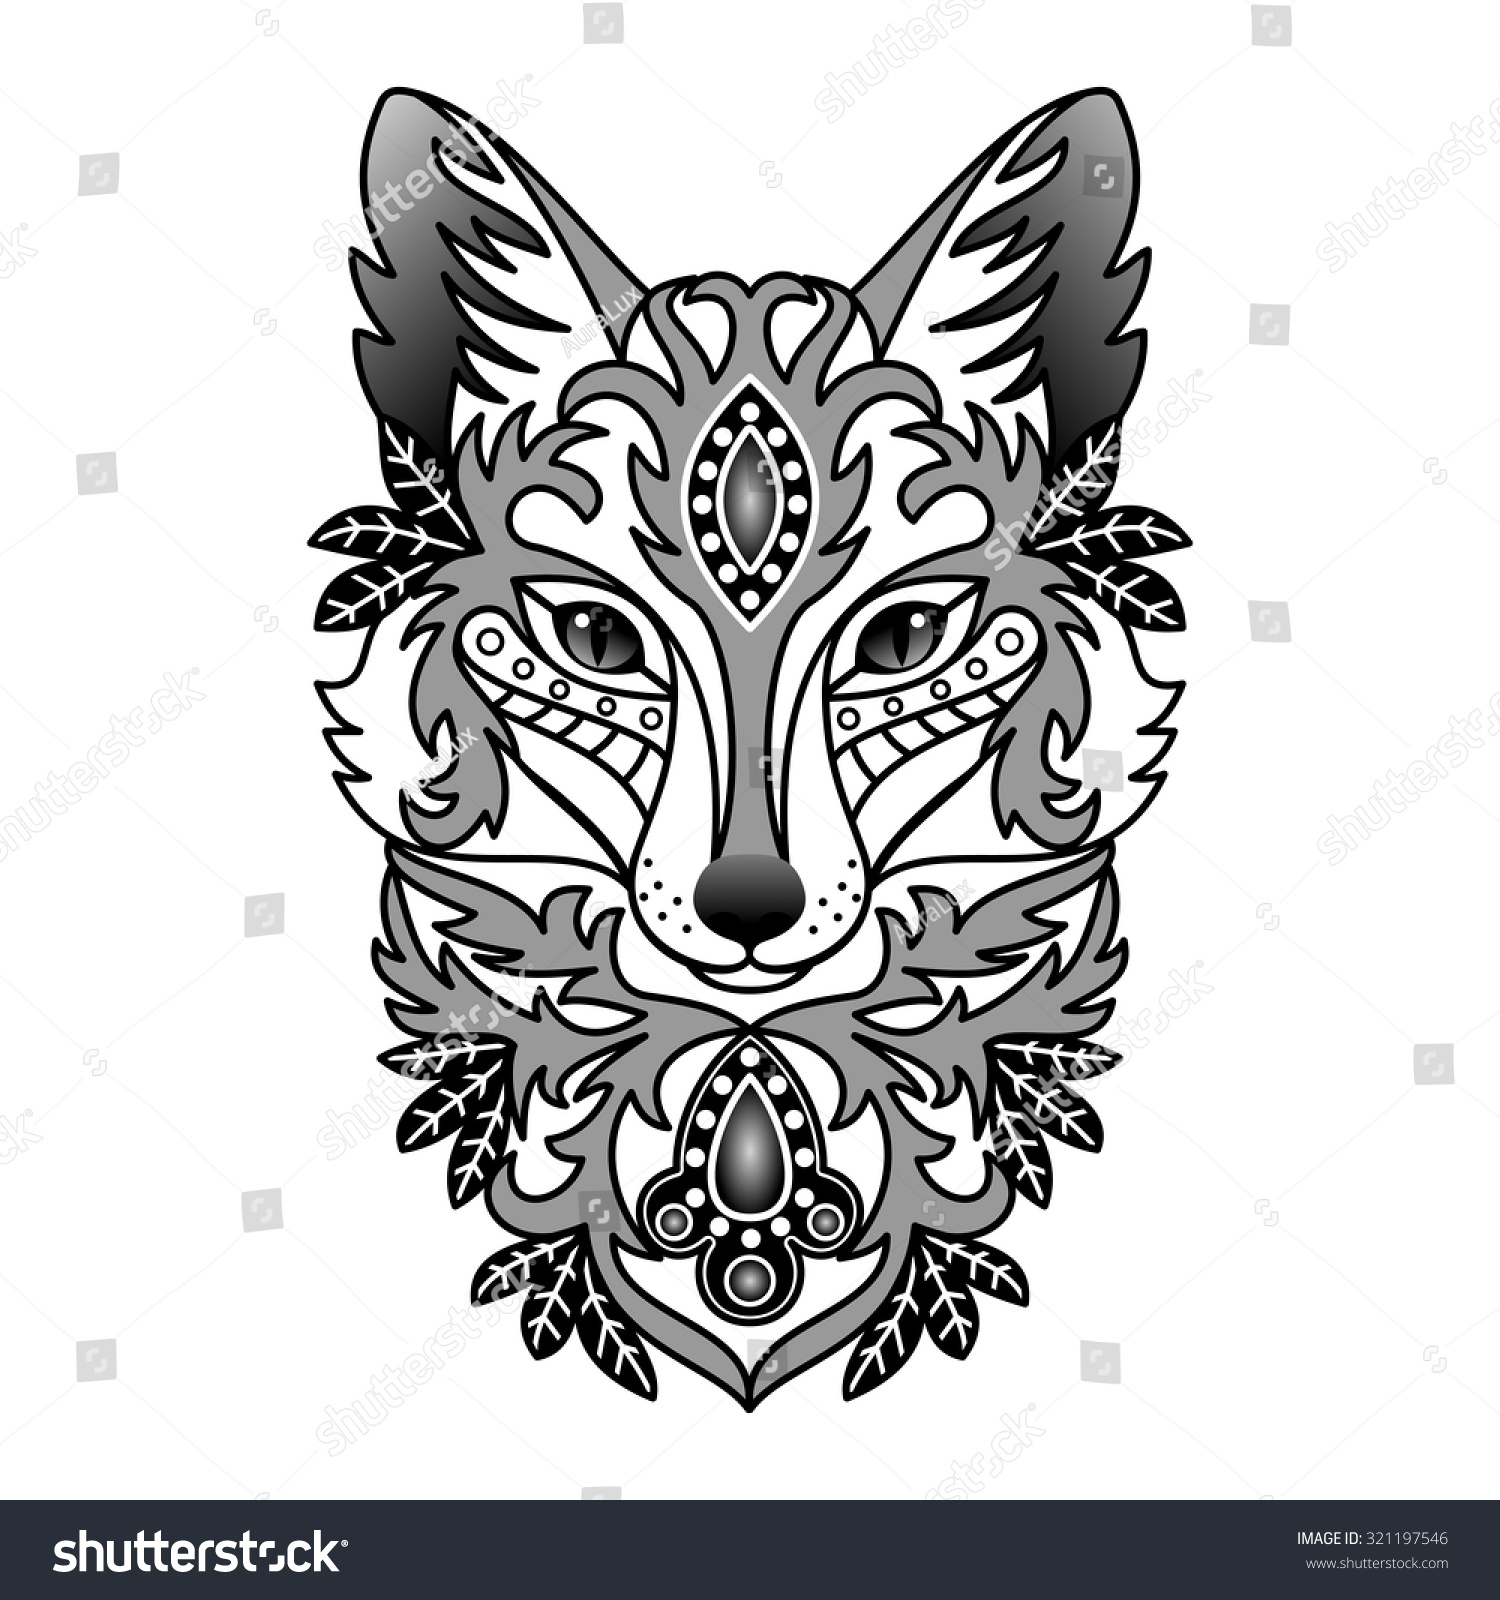 fox head clipart black and white